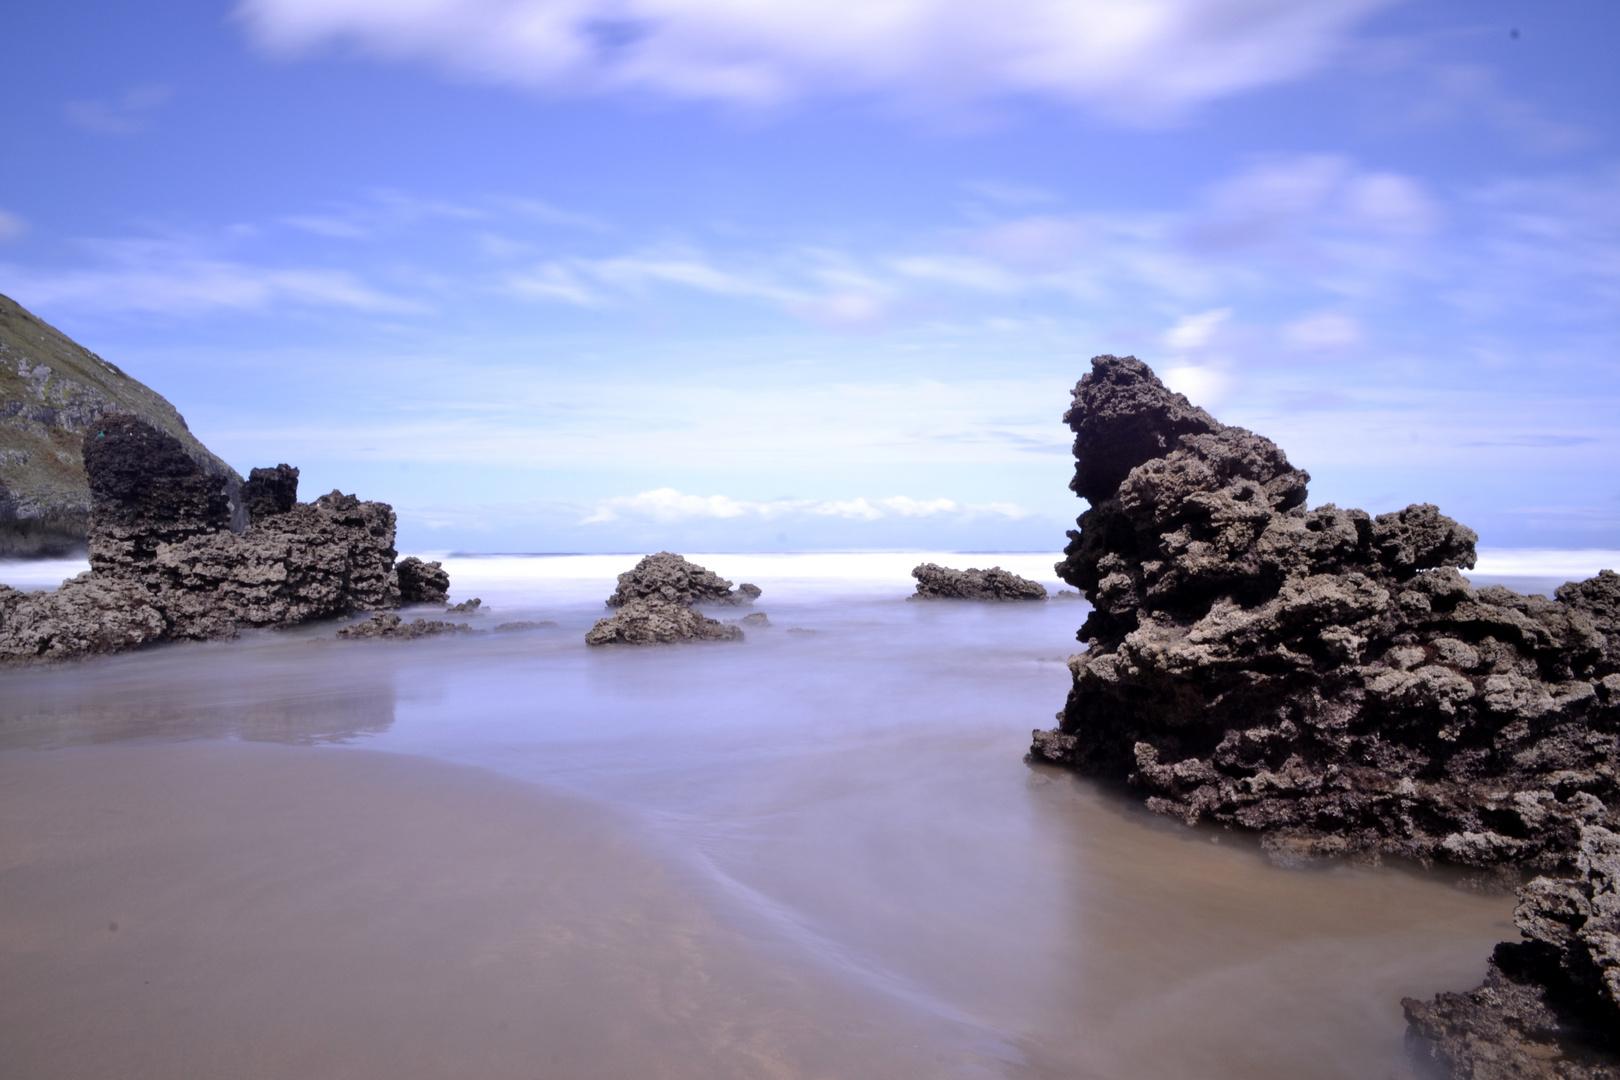 Playa espumosa